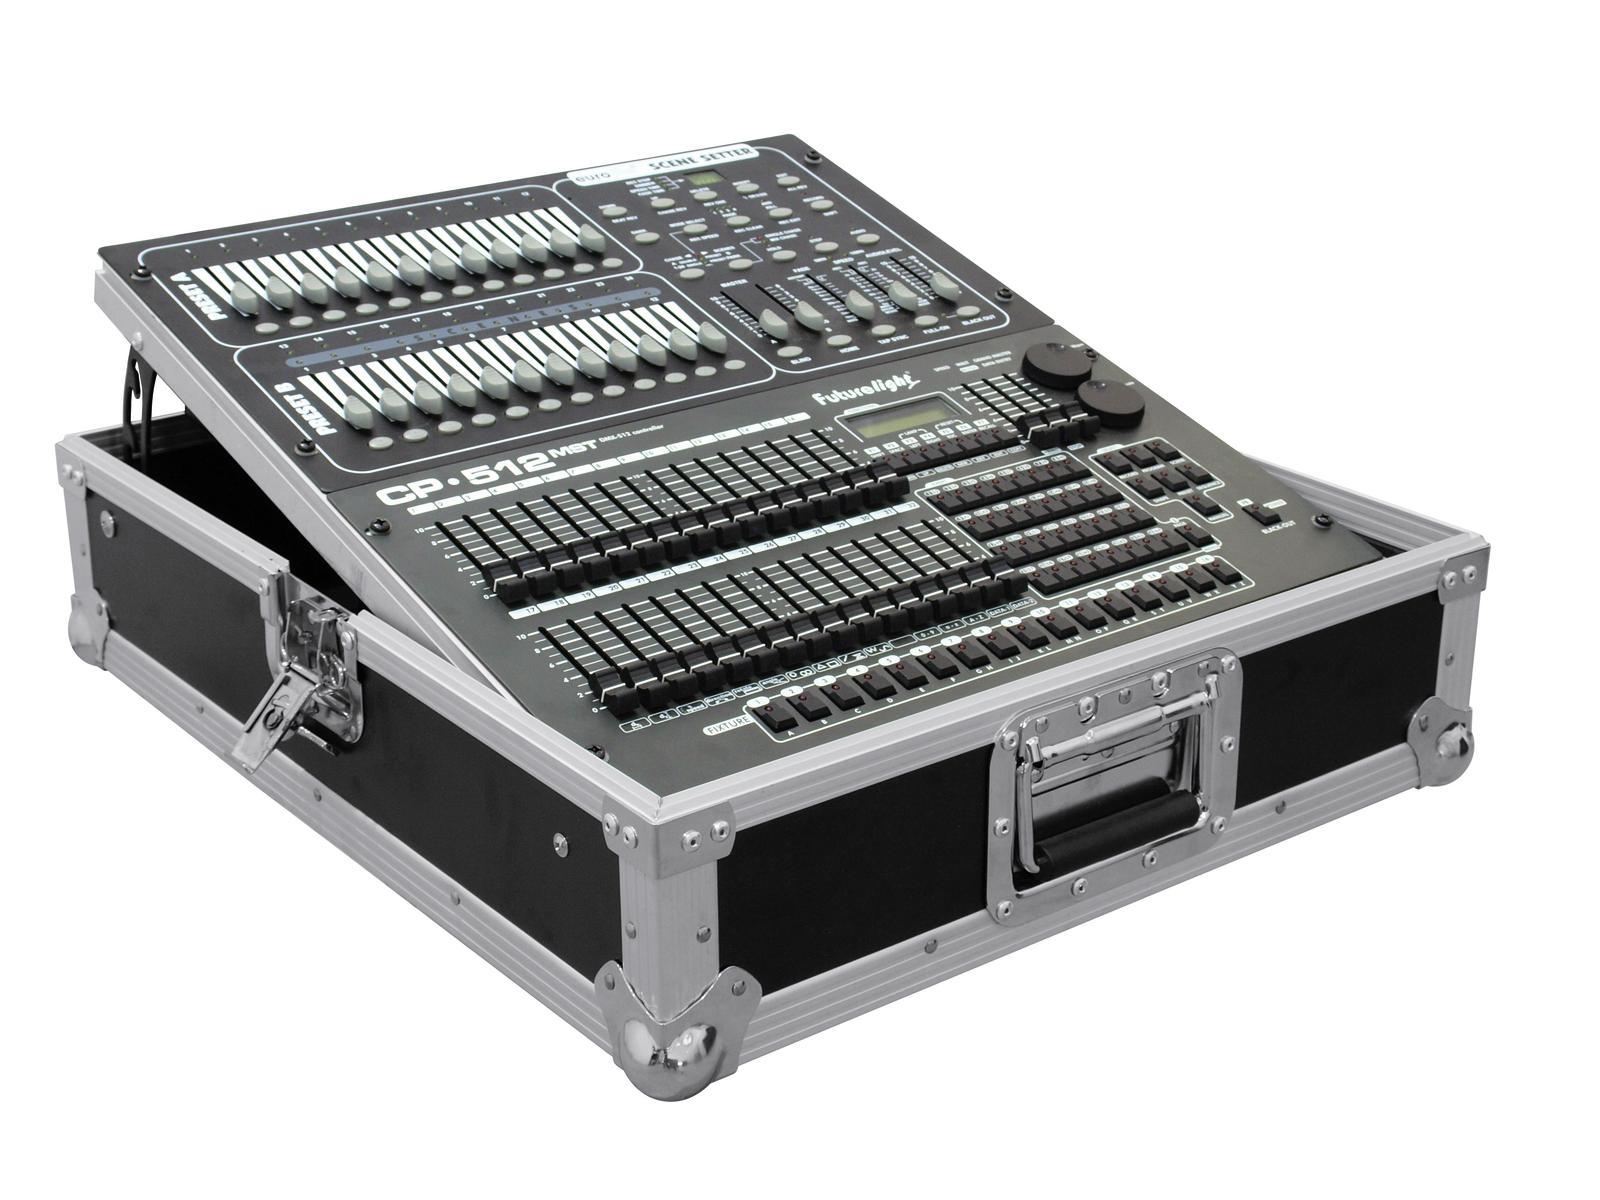 Flight Case Custodia per Dj Mixer Audio Luci Inclinato 12U Roadinger Pro MCV-19